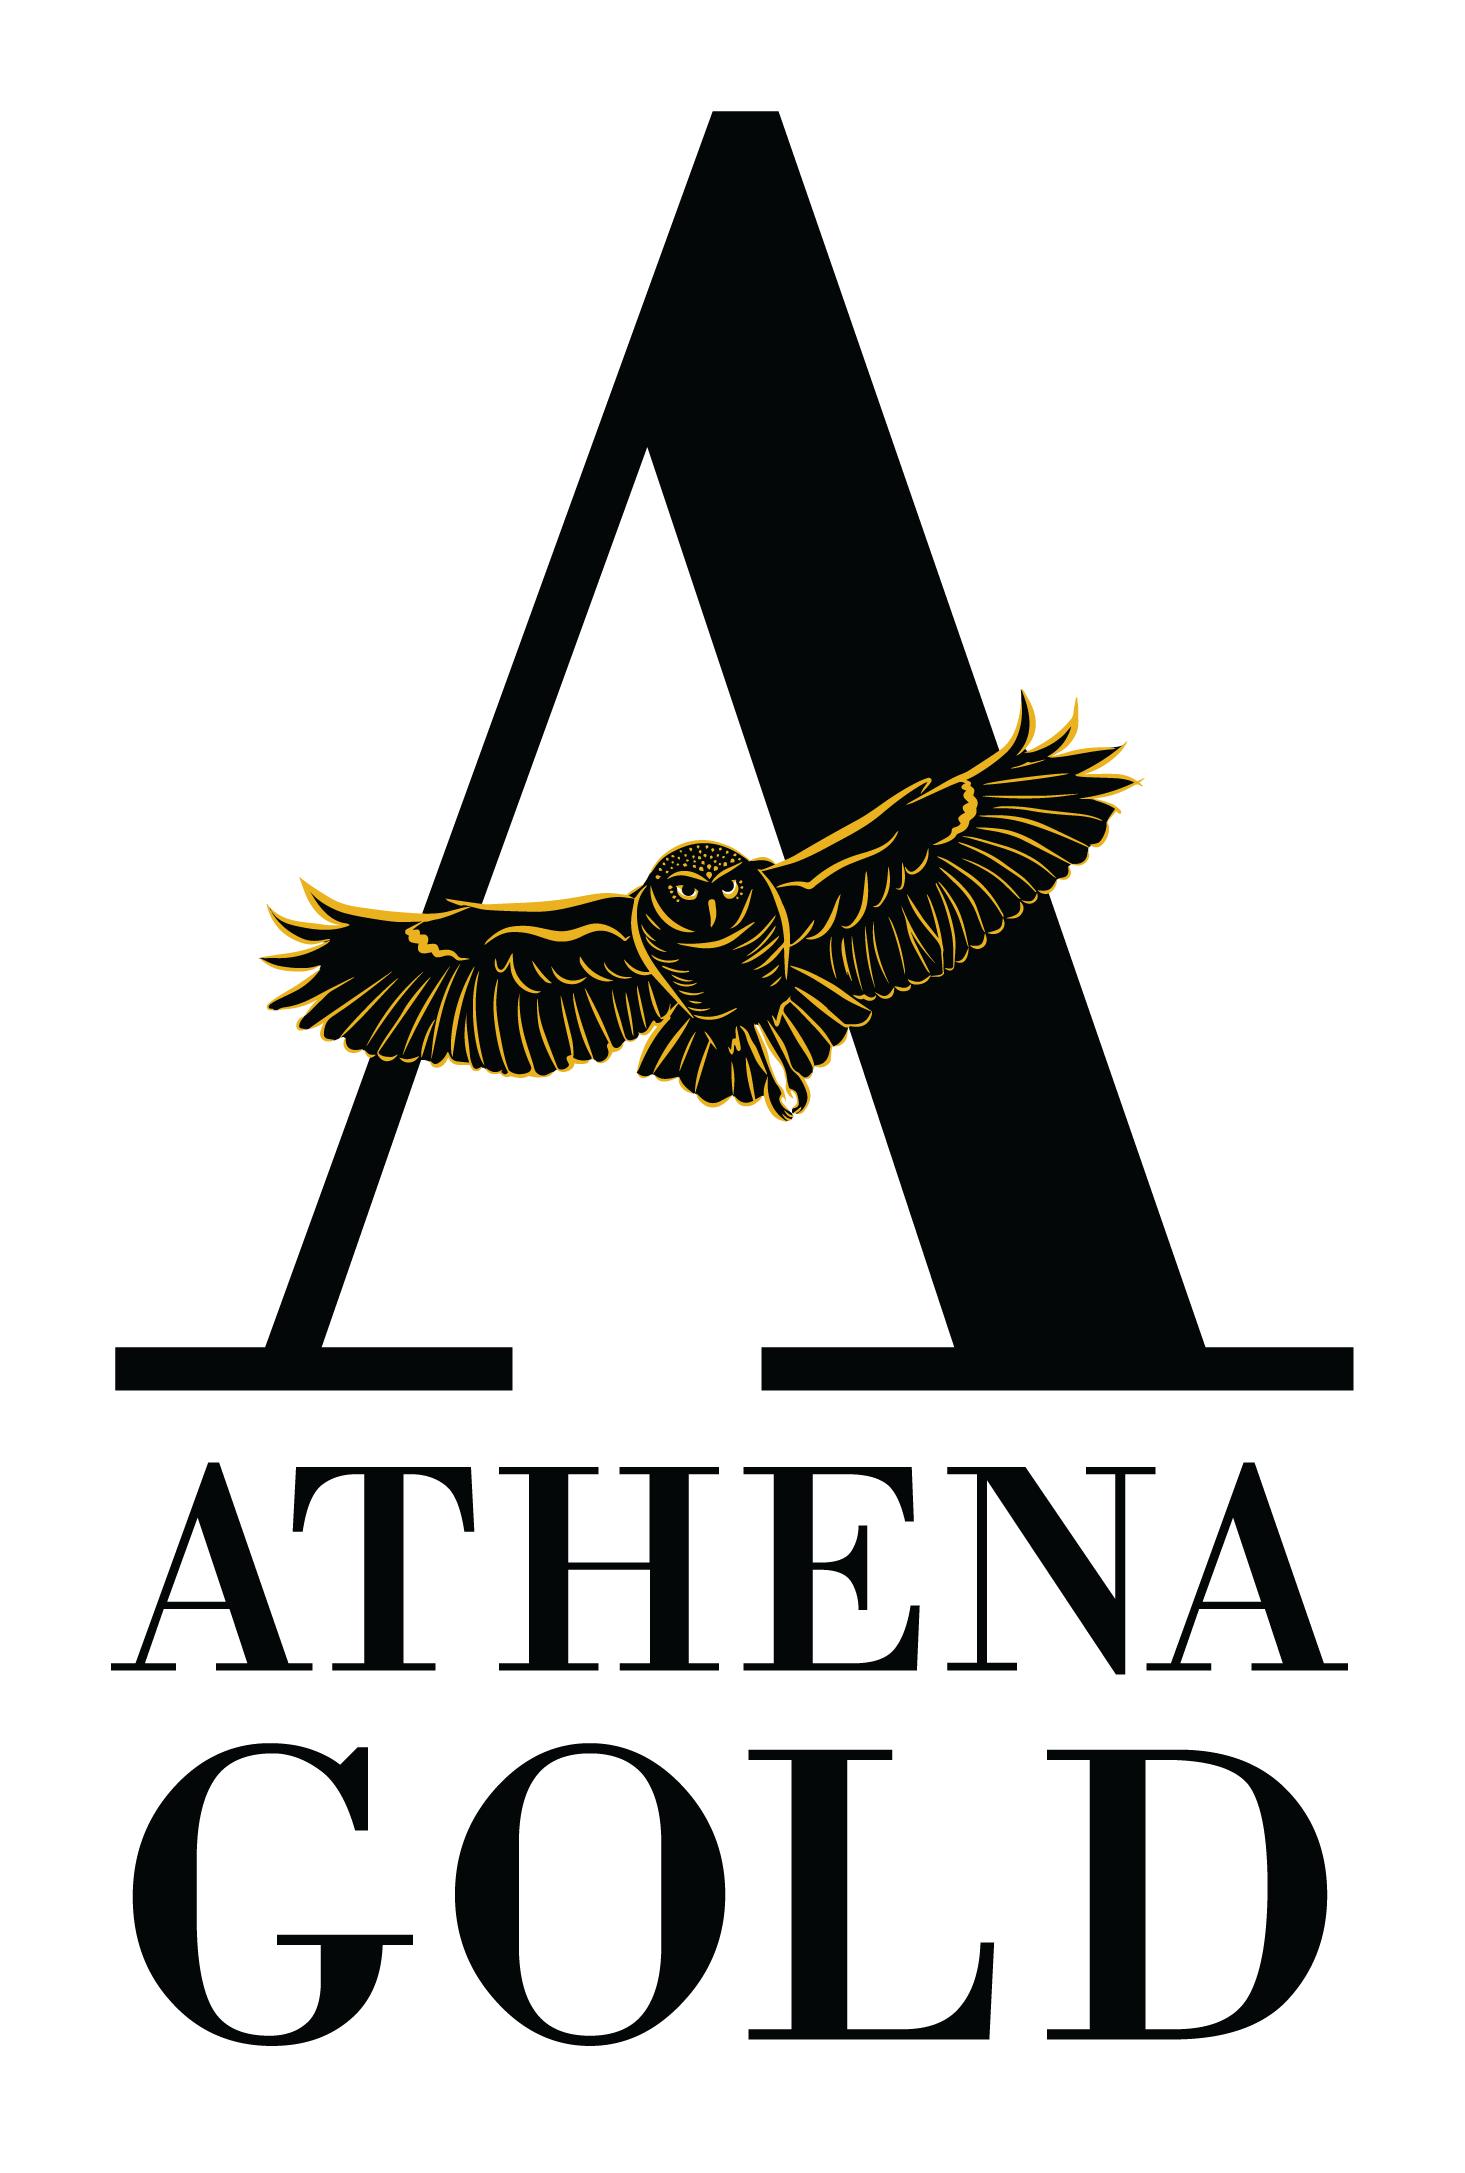 Athena Gold Corporation